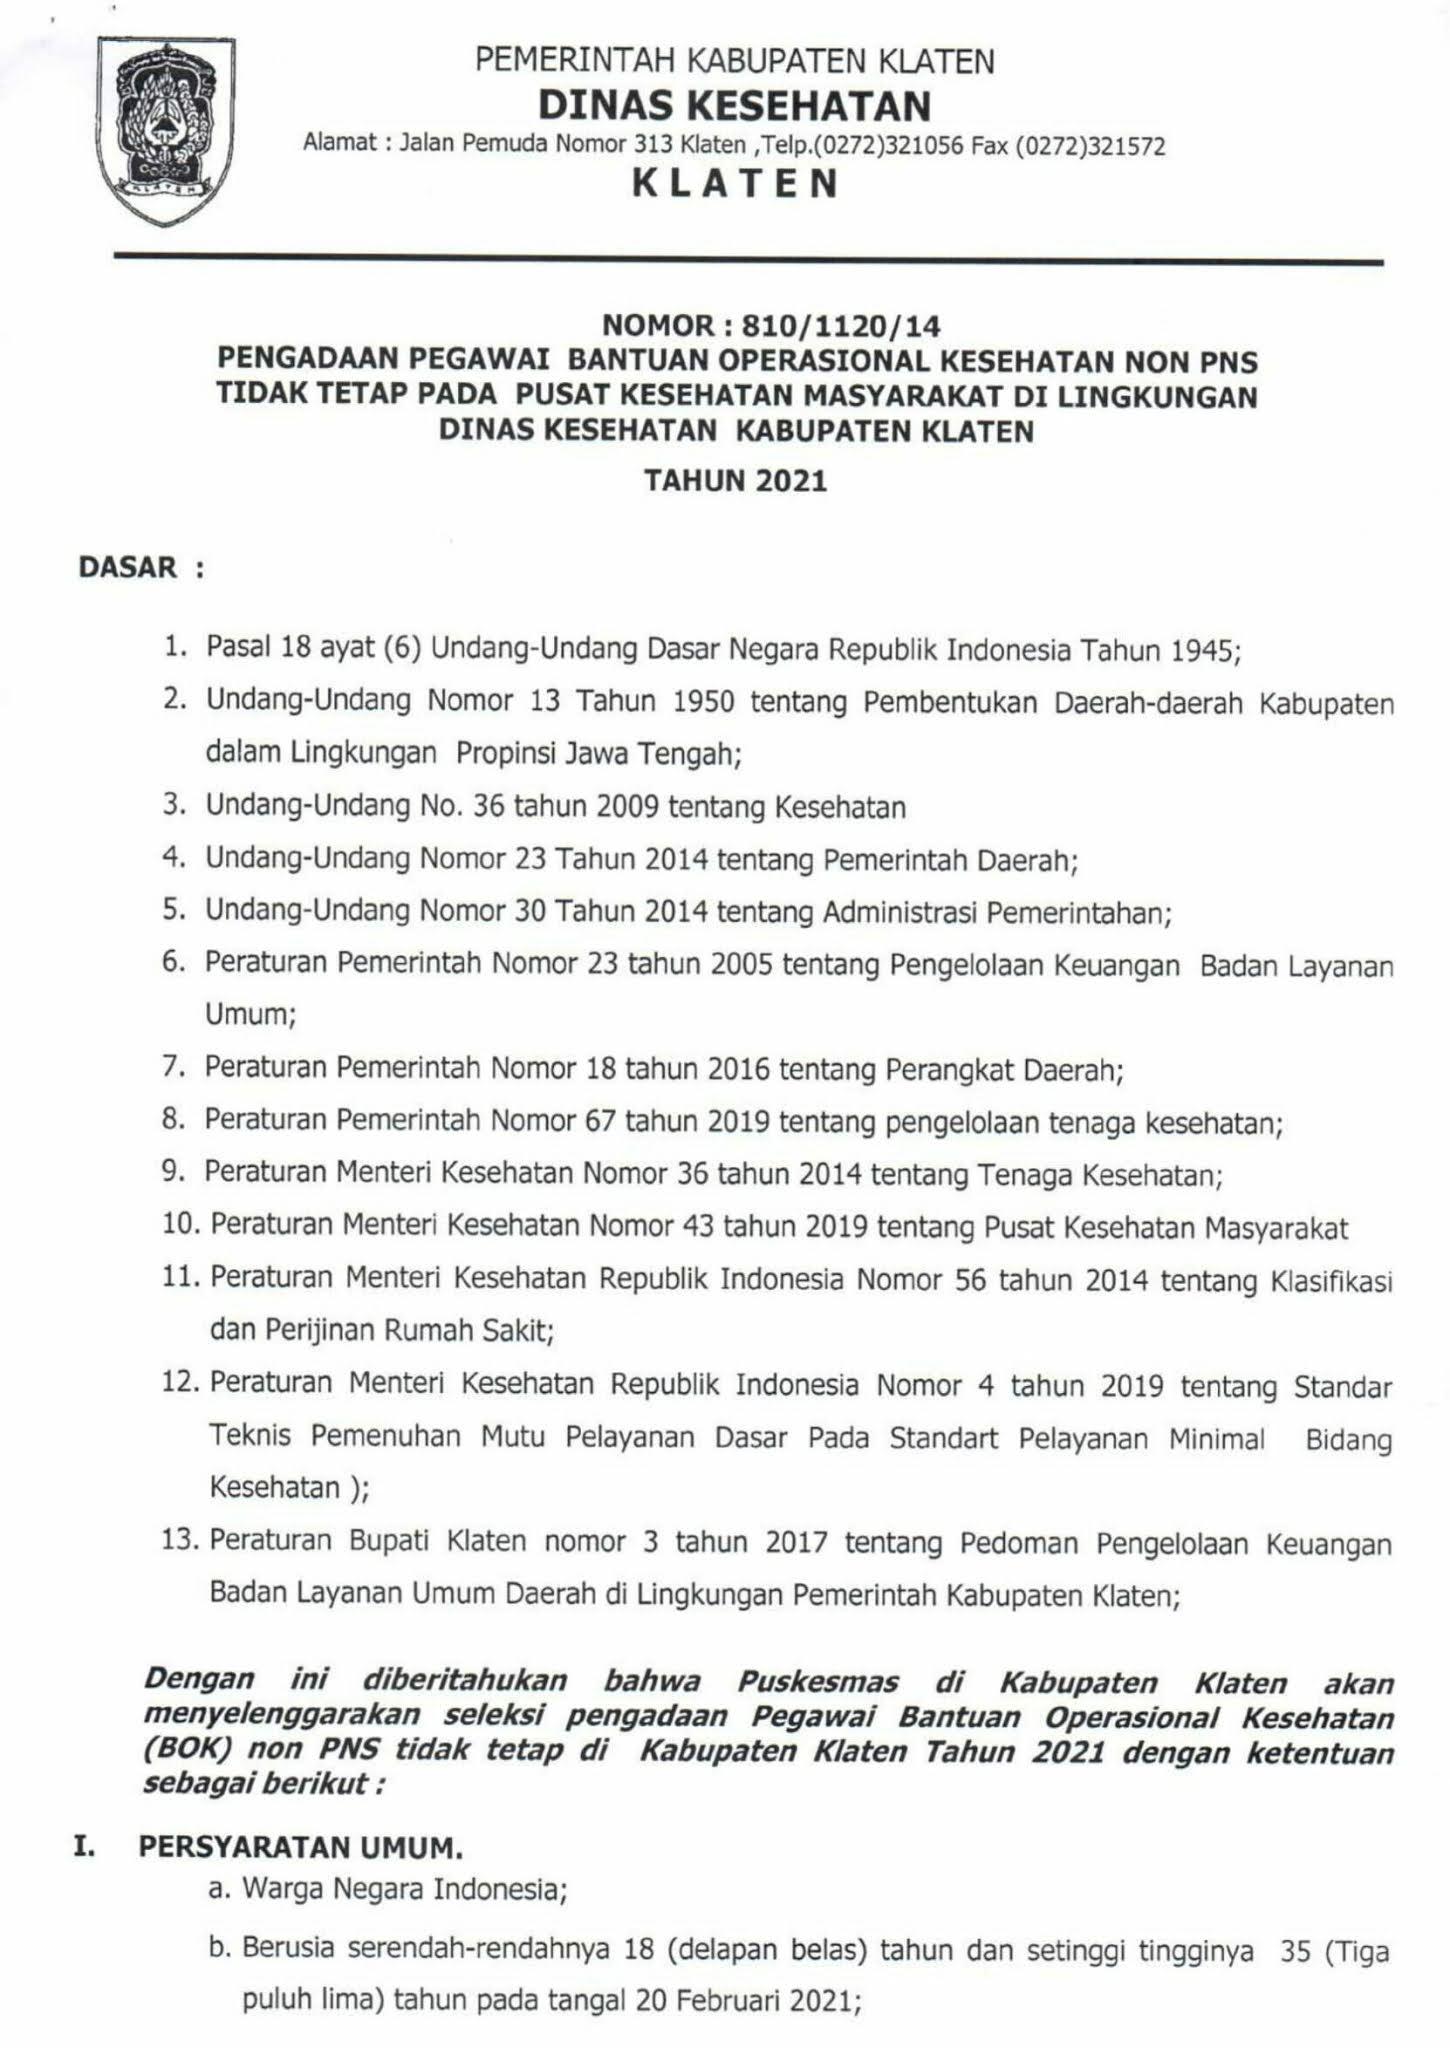 Lowongan Kerja Lowongan Kerja Non Pns Dinas Kesehatan Kabupaten Klaten Februari 2021